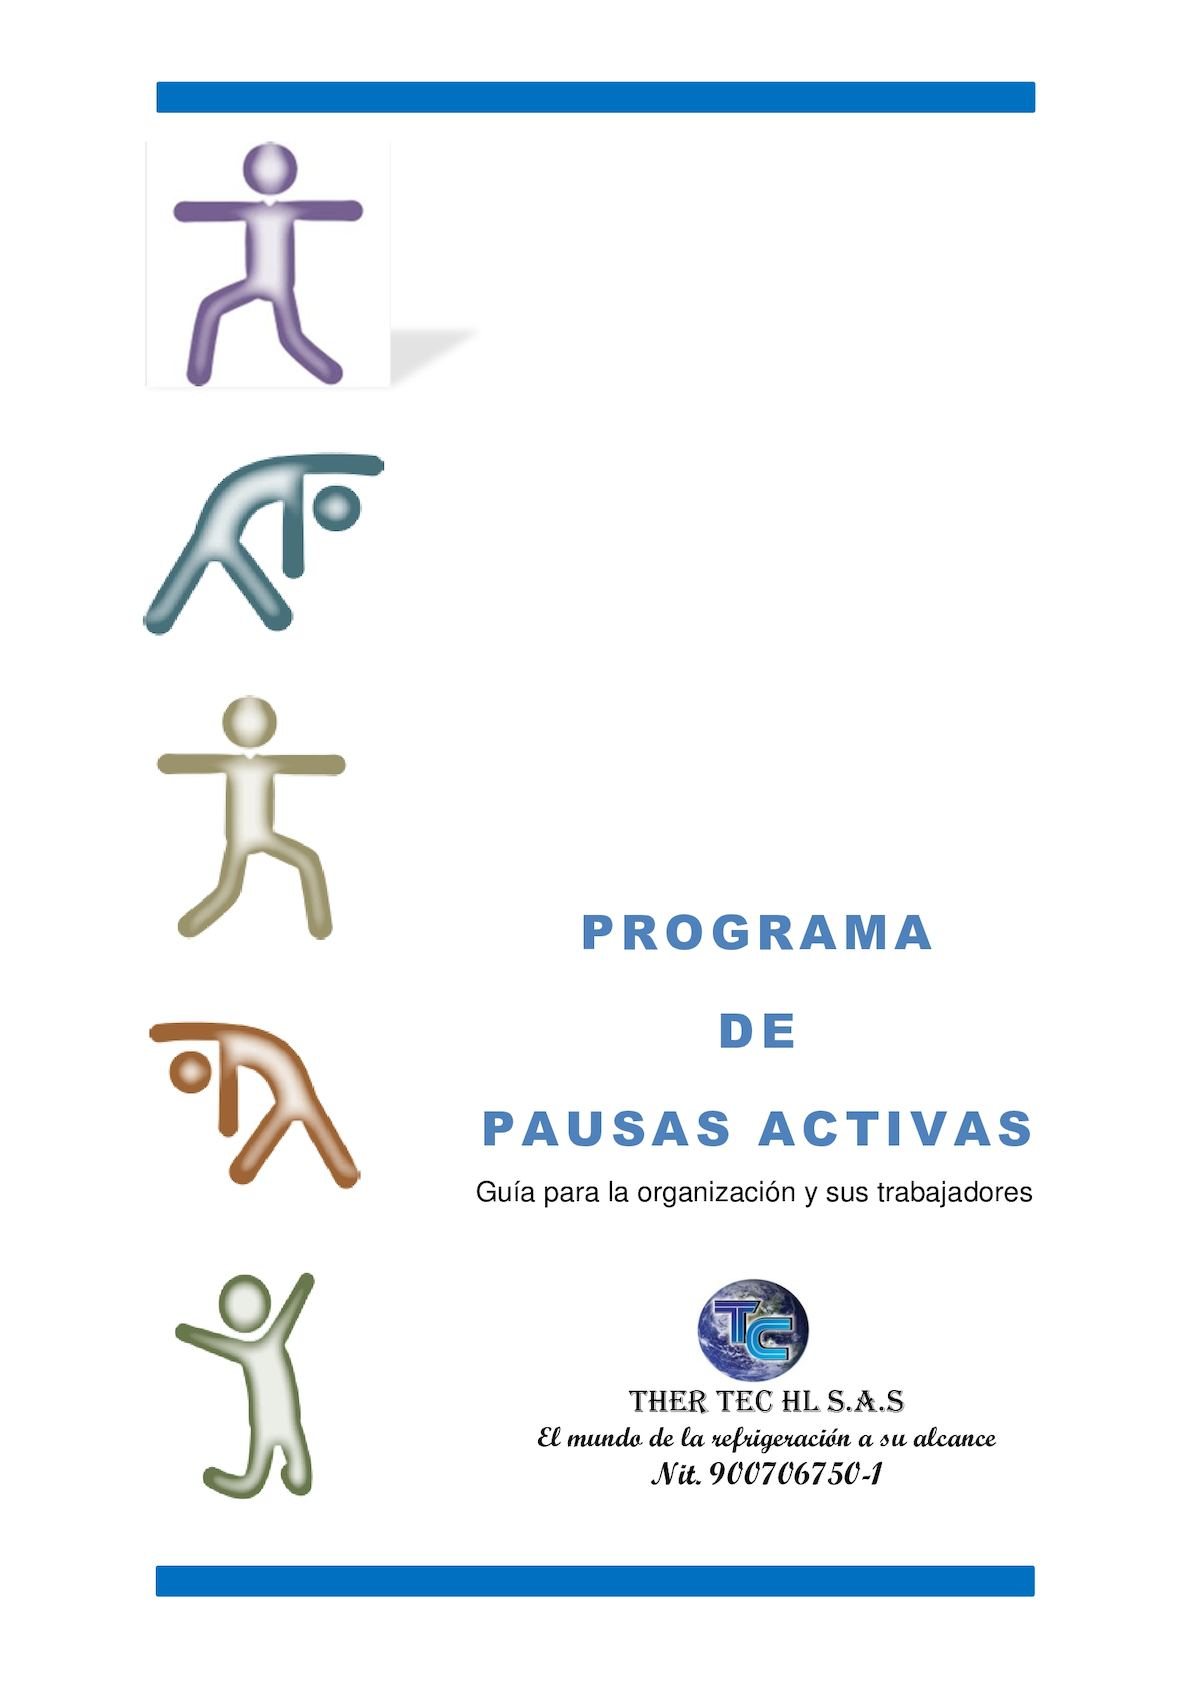 Programa De Pausas Activas Pyme Ther Tec Hl S A S Ficha 955960 Grupo 69545